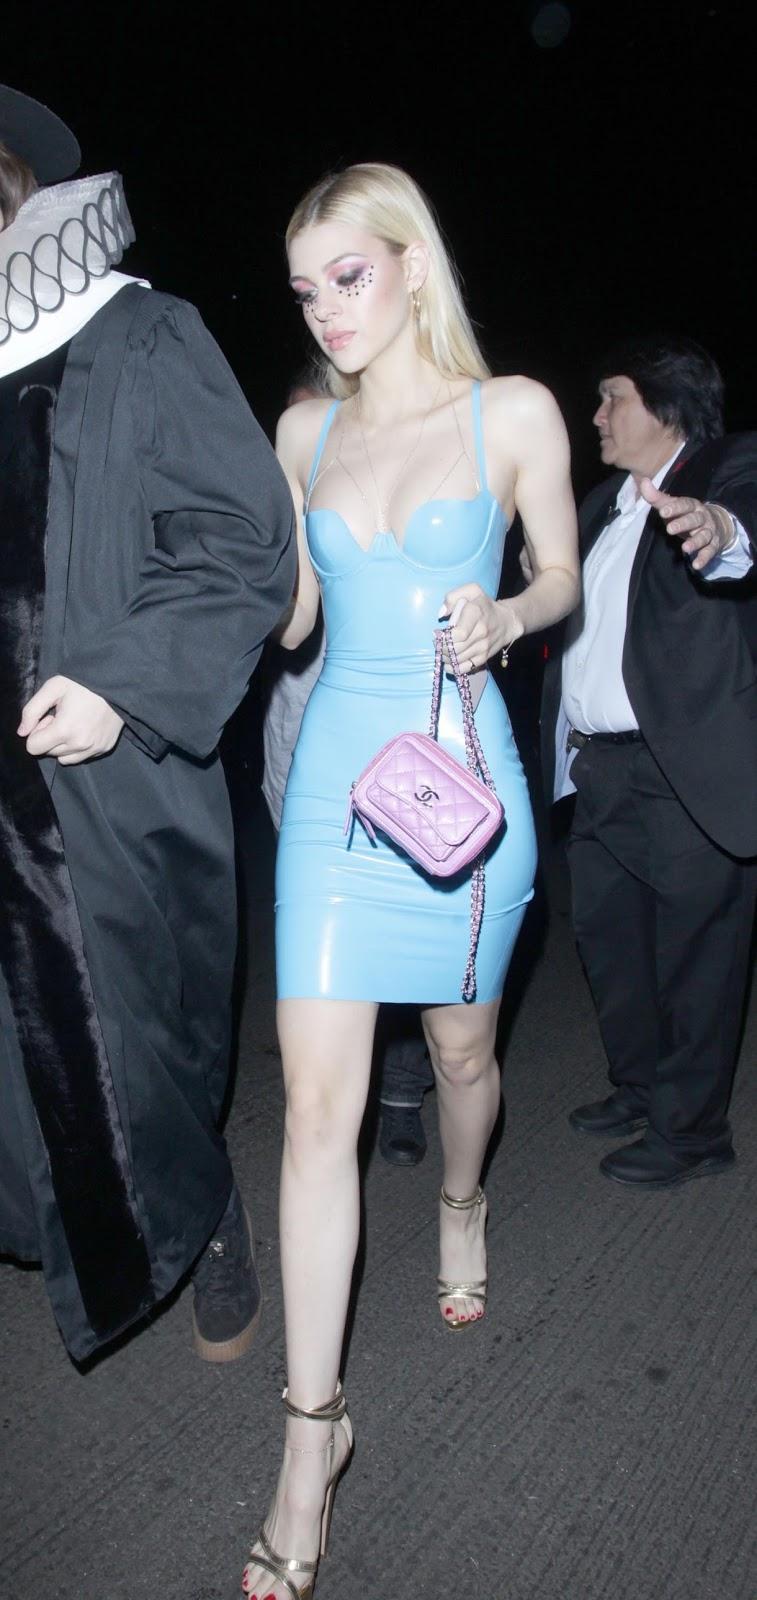 Lovely Ladies in Leather: Nicola Peltz in a latex mini-dress